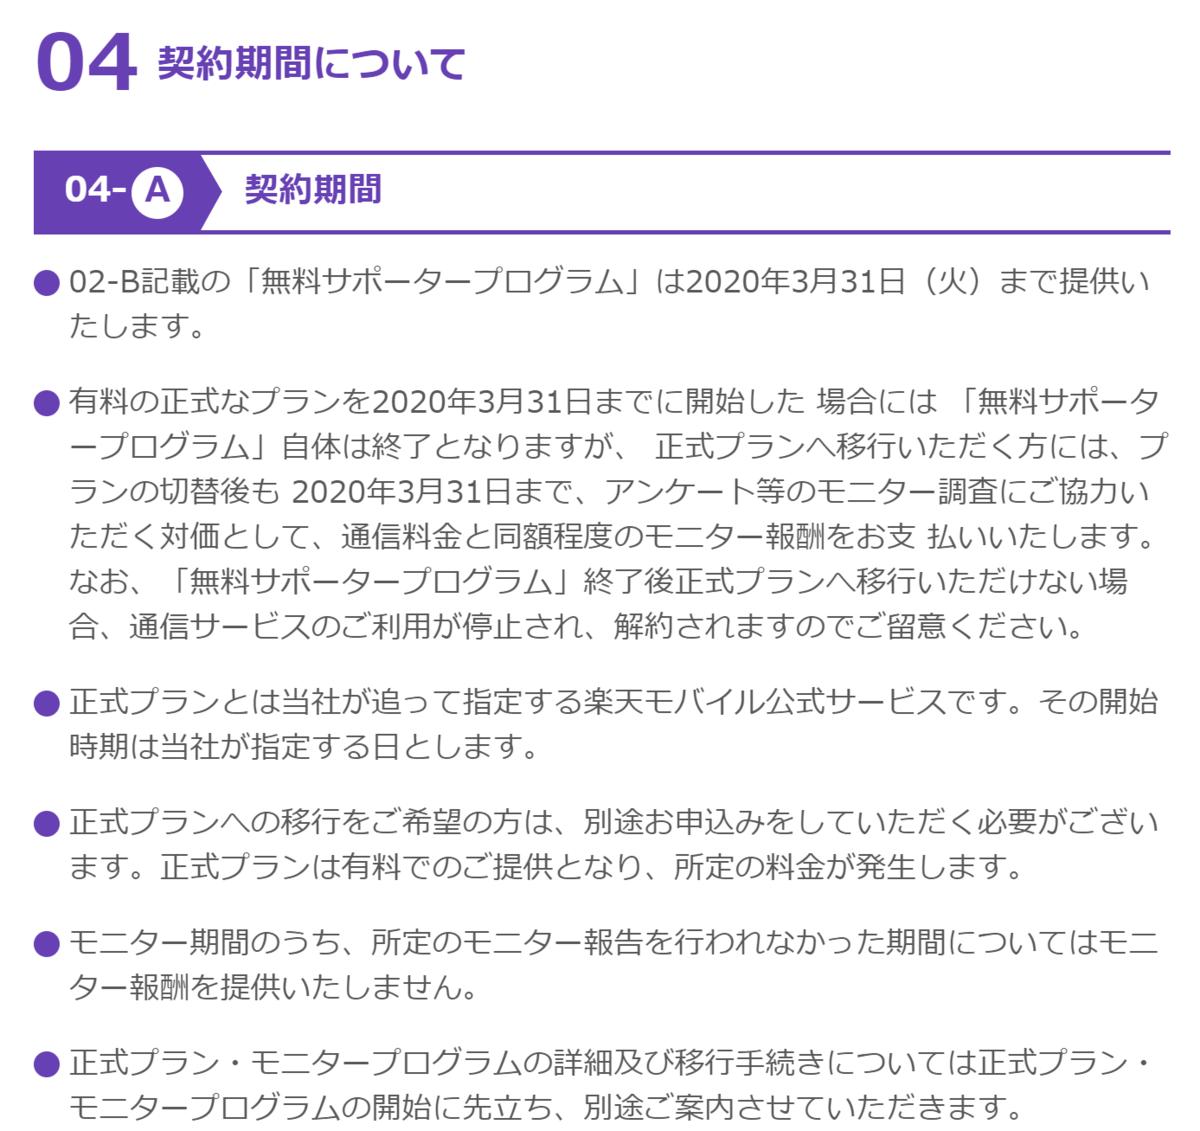 f:id:itokoichi:20200203121950p:plain